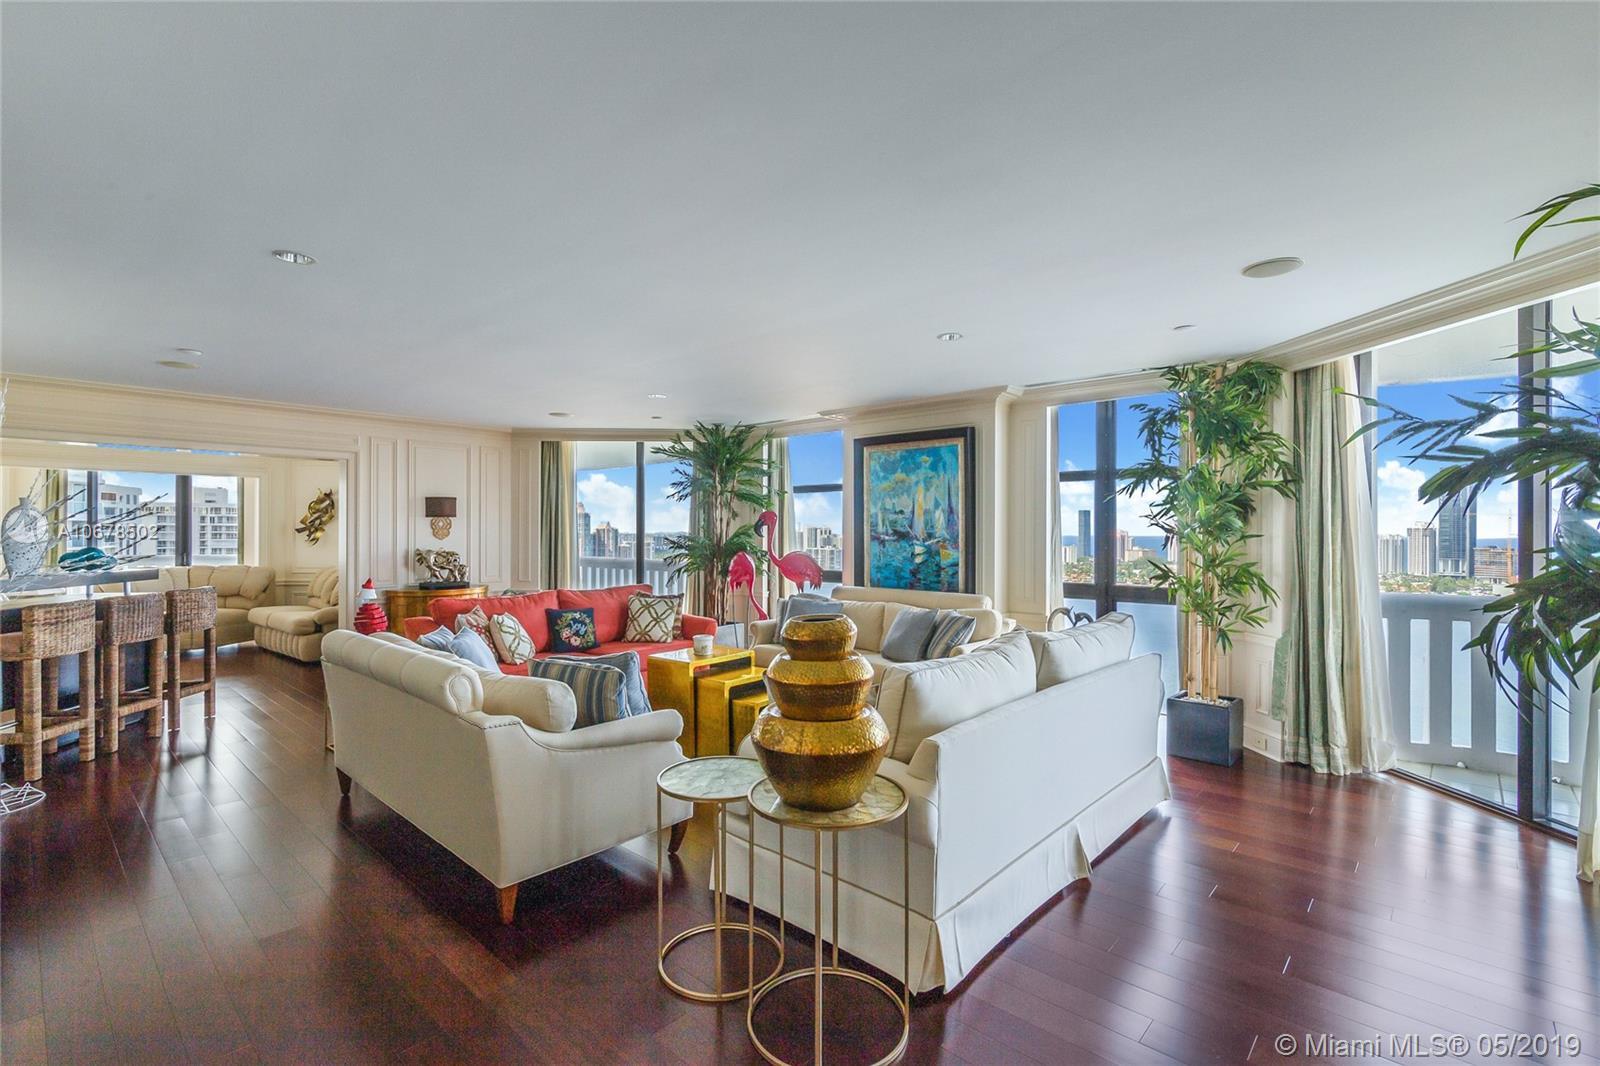 3000 Island Blvd #3003, Aventura, FL 33160 - Aventura, FL real estate listing